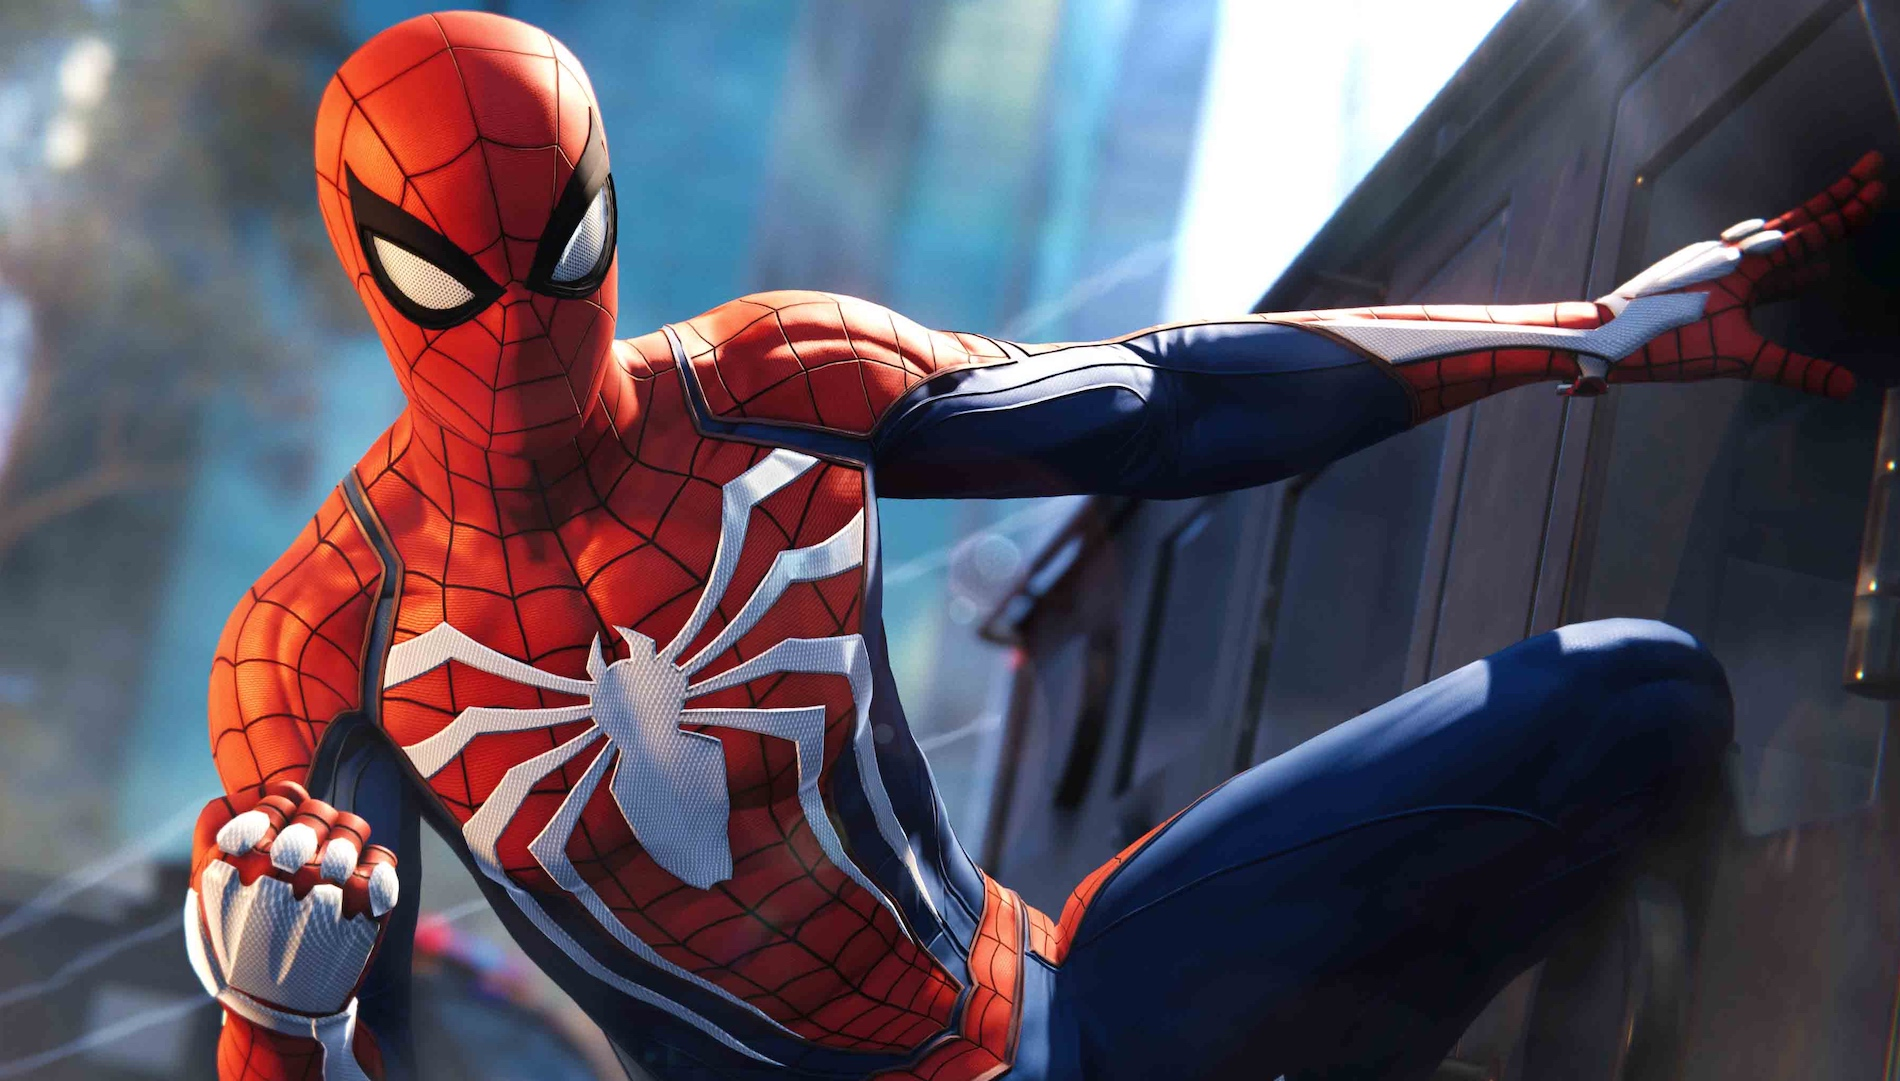 Sony membeli Insomniac Games, pengembang 'Spider-Man' dan 'Ratchet & Clank' 1